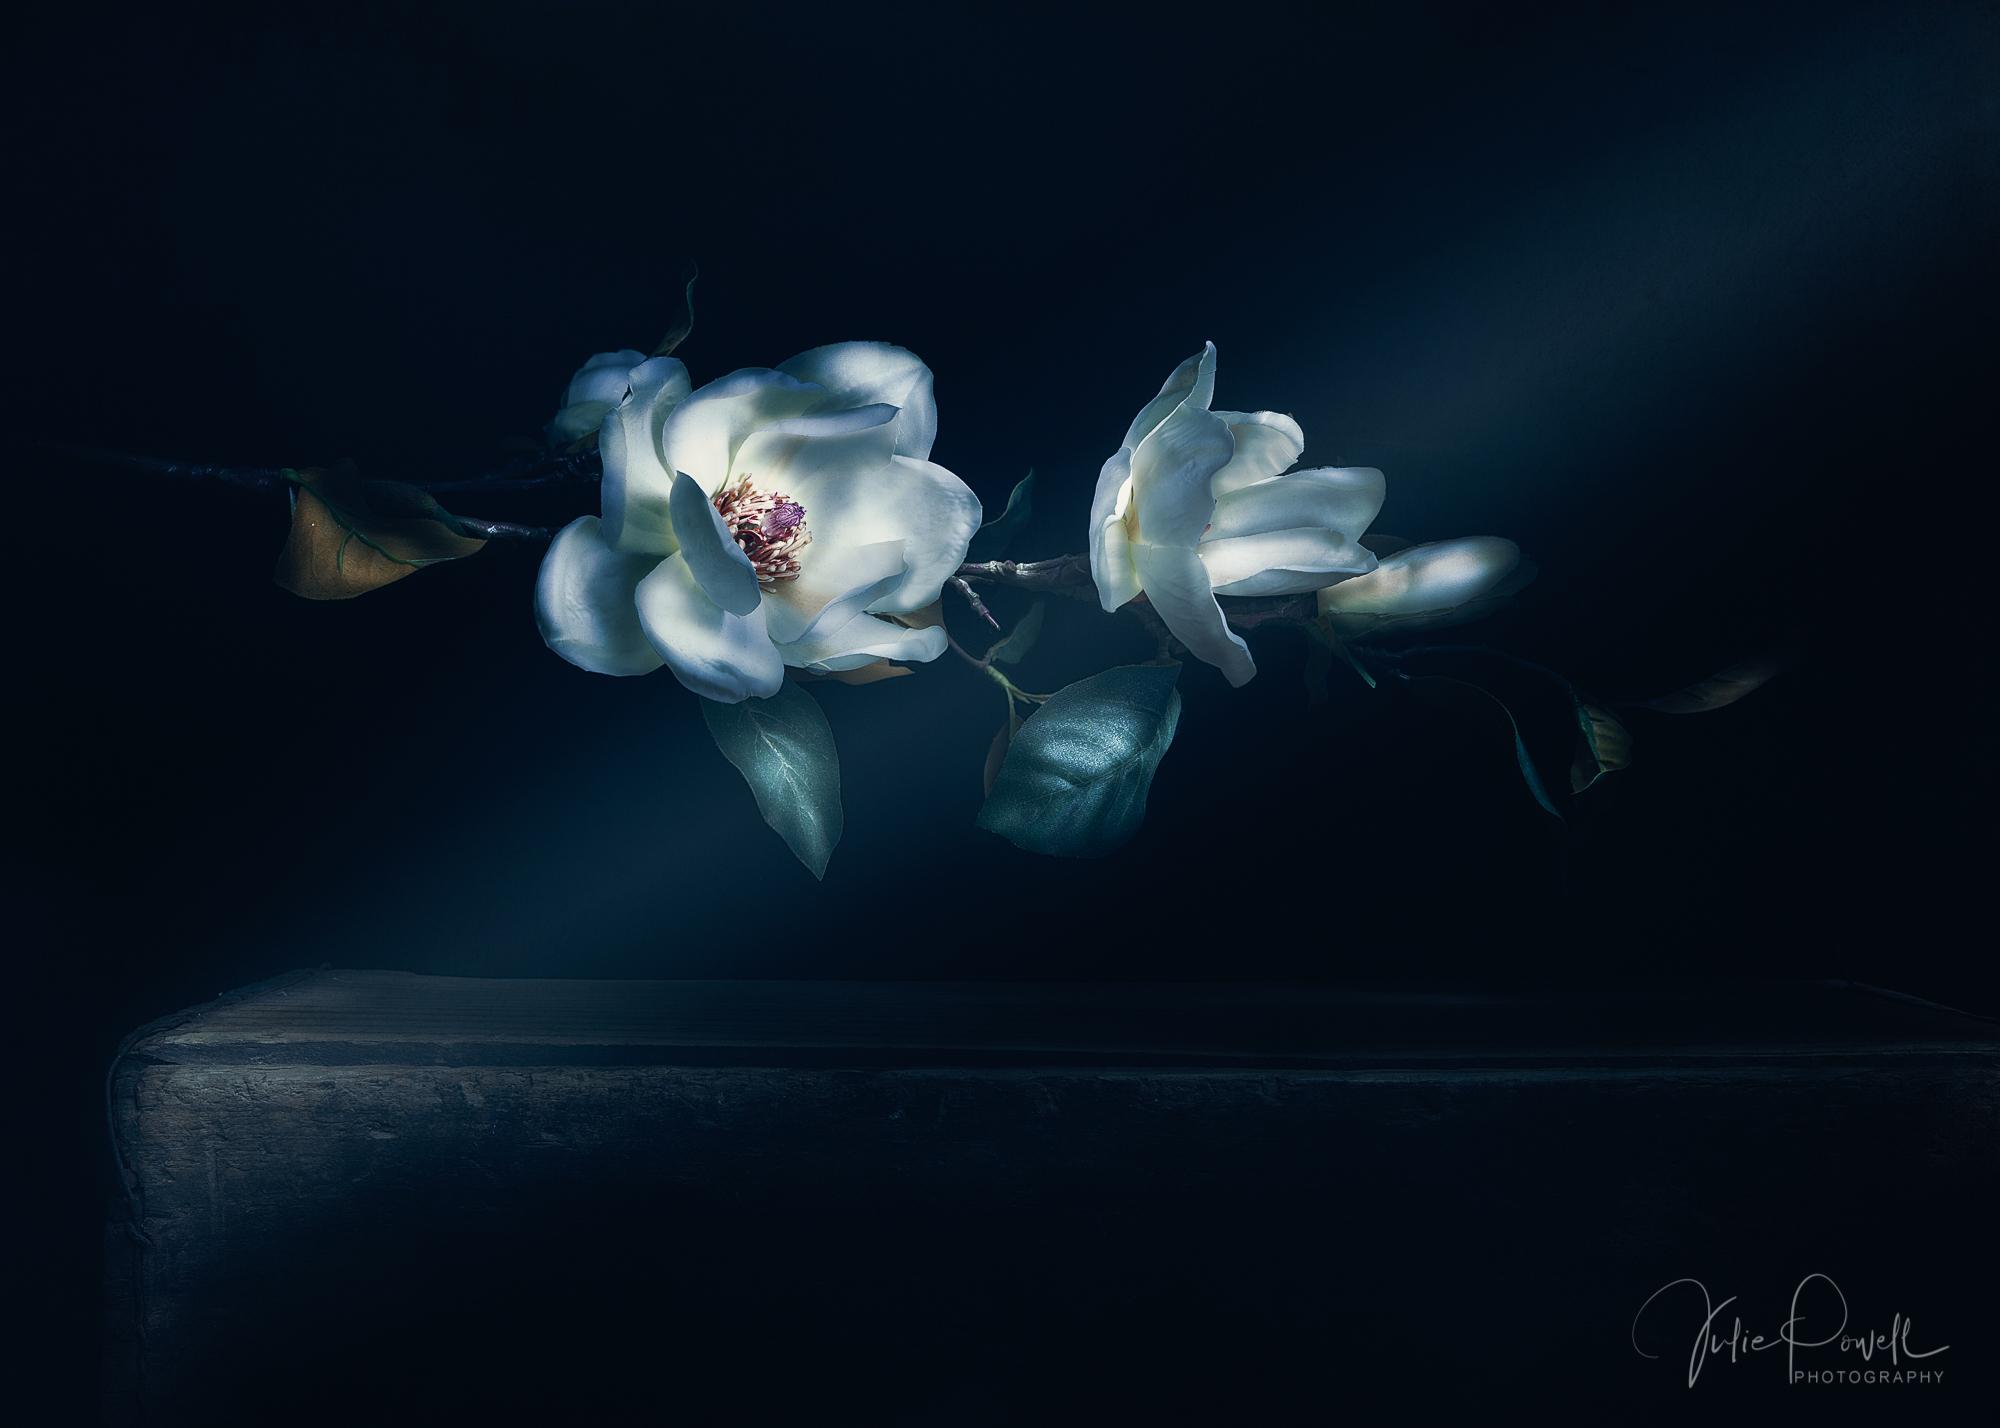 Julie Powell_Magnolias.jpg